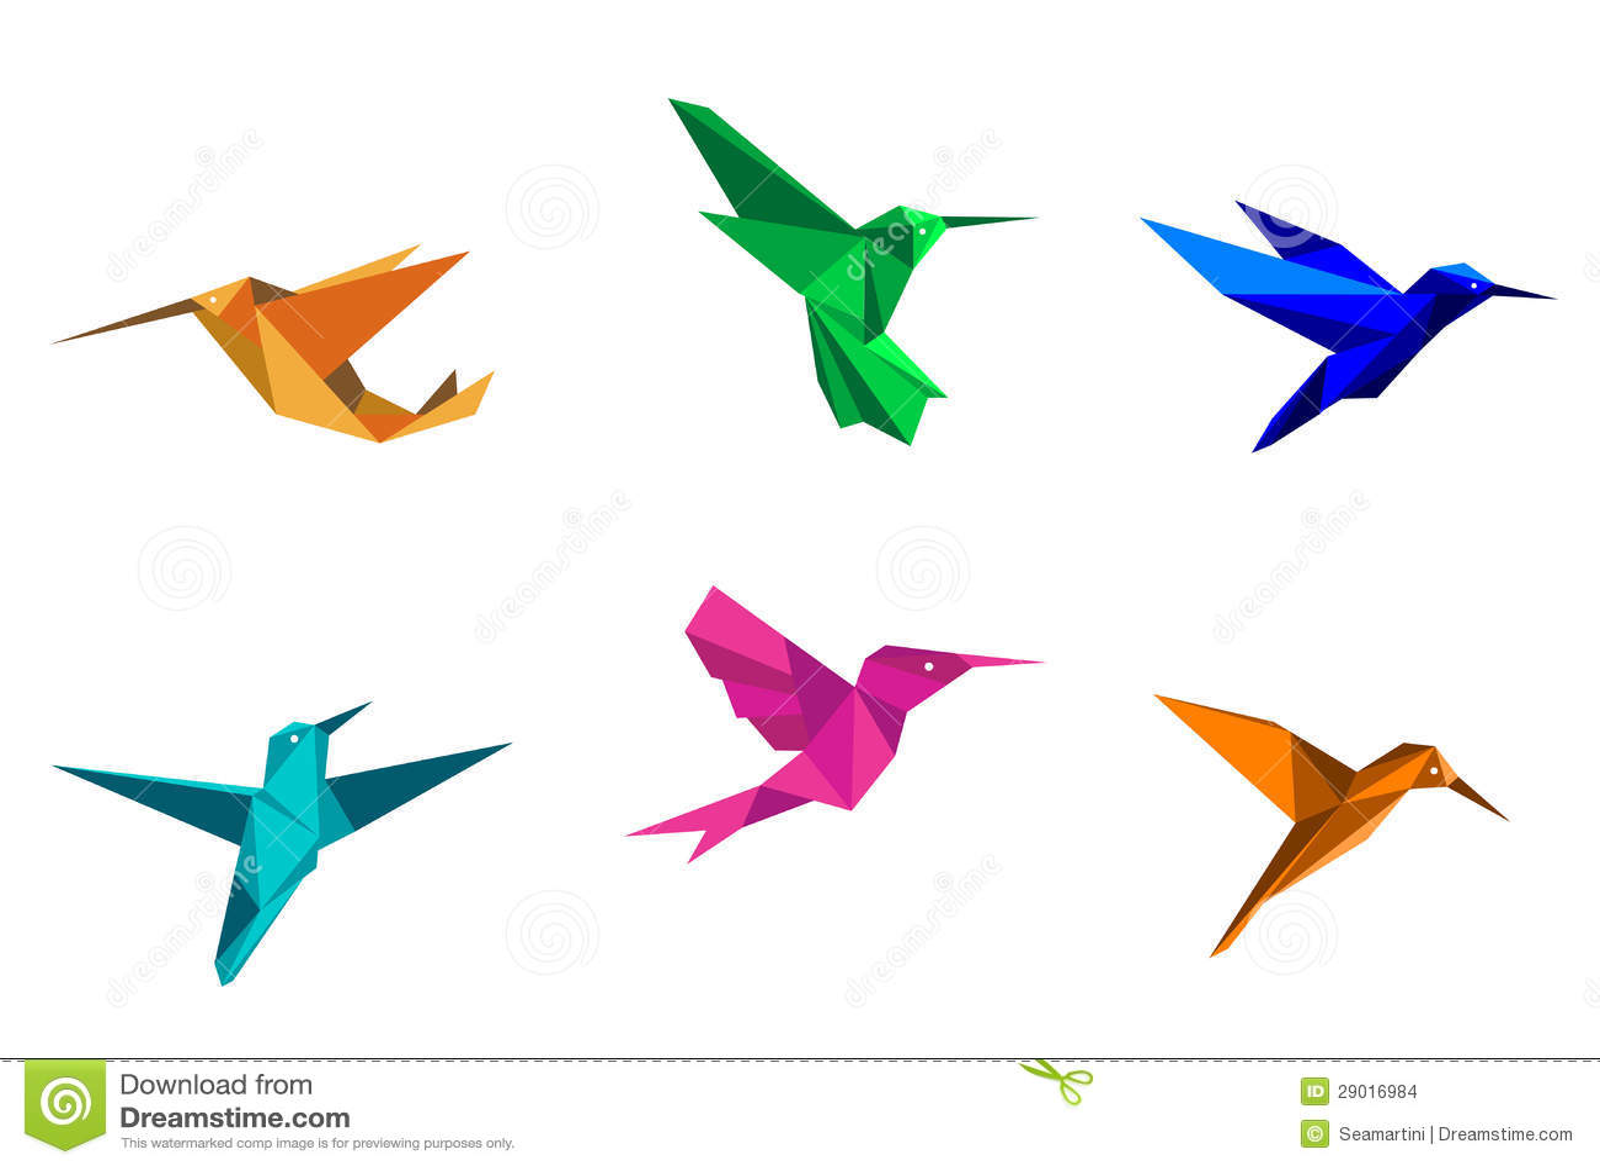 tropical bird silhouette